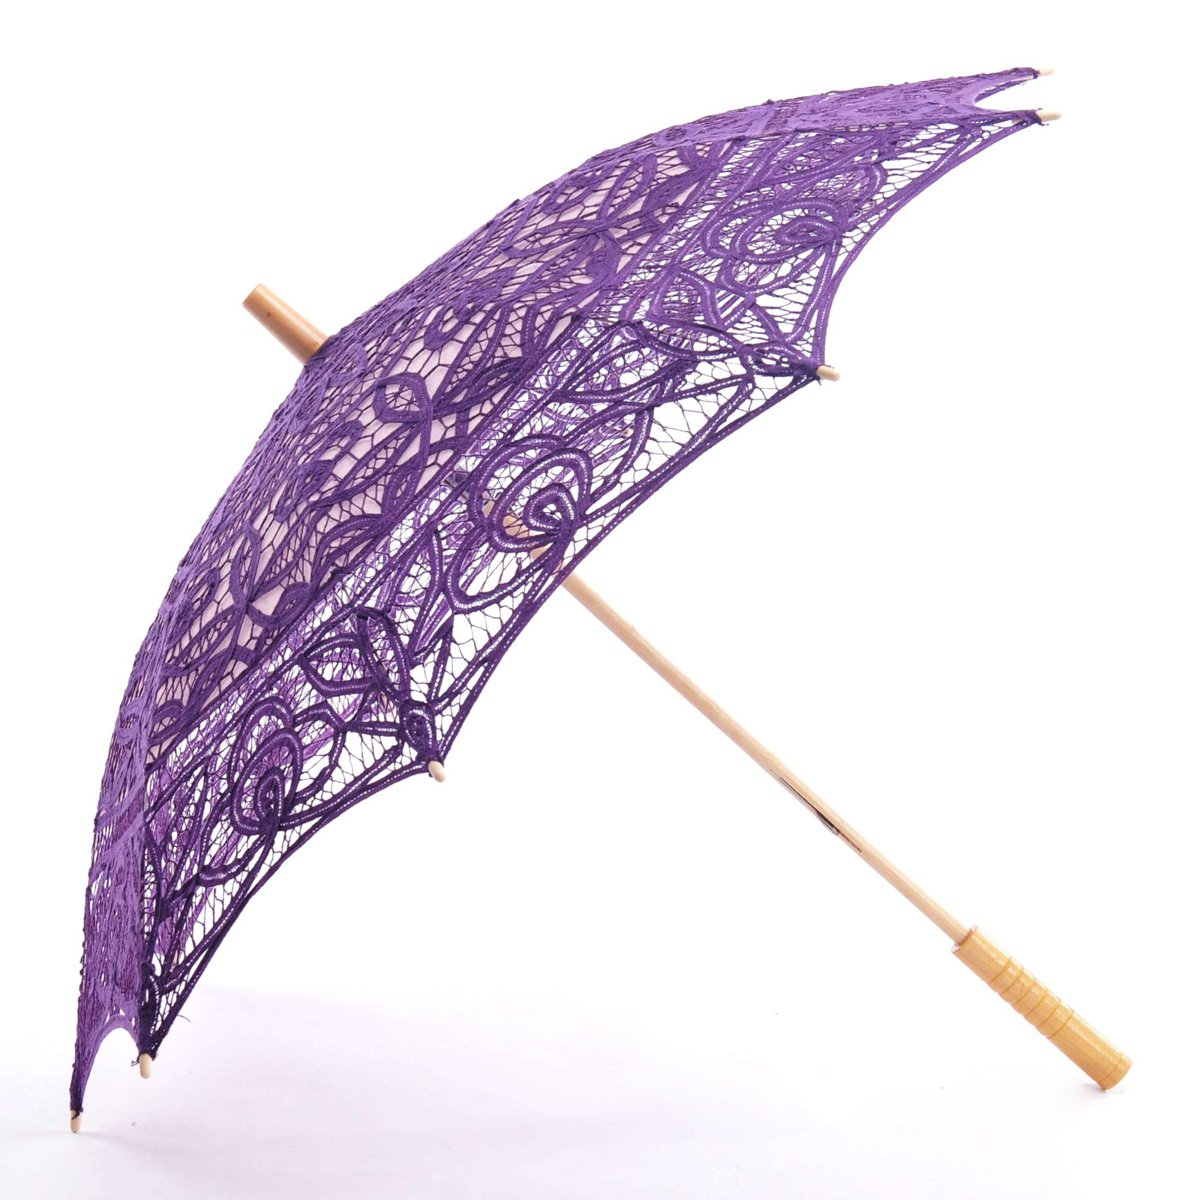 Topwedding Battenburg Lace Outdoor Wedding Parasol Bridal Shower Umbrella, Grape